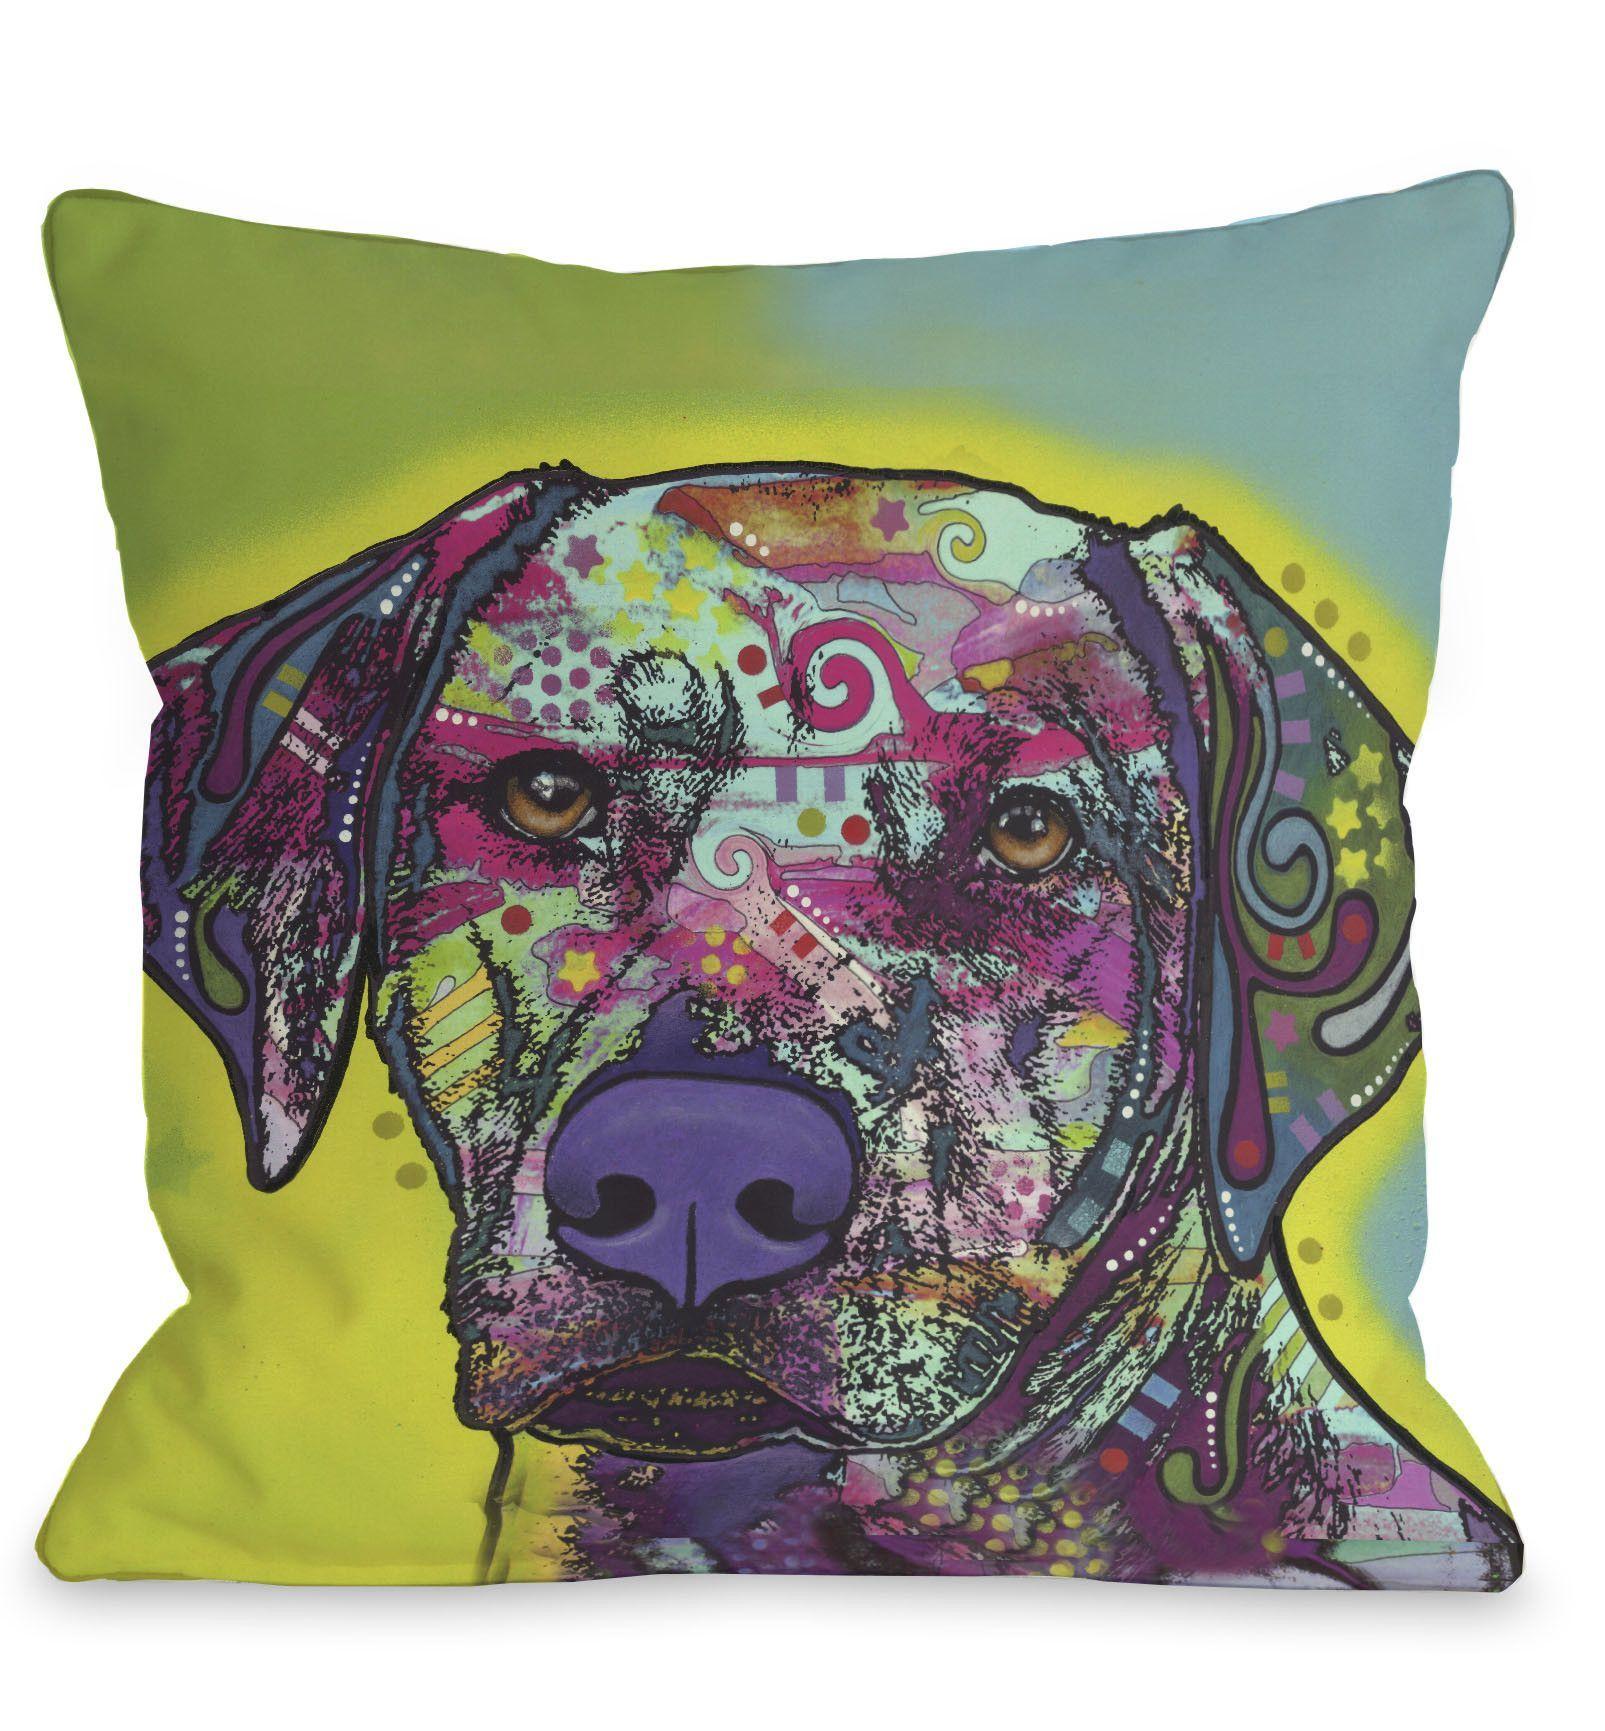 Doggy Décor Rhodesian Ridgeback Throw Pillow